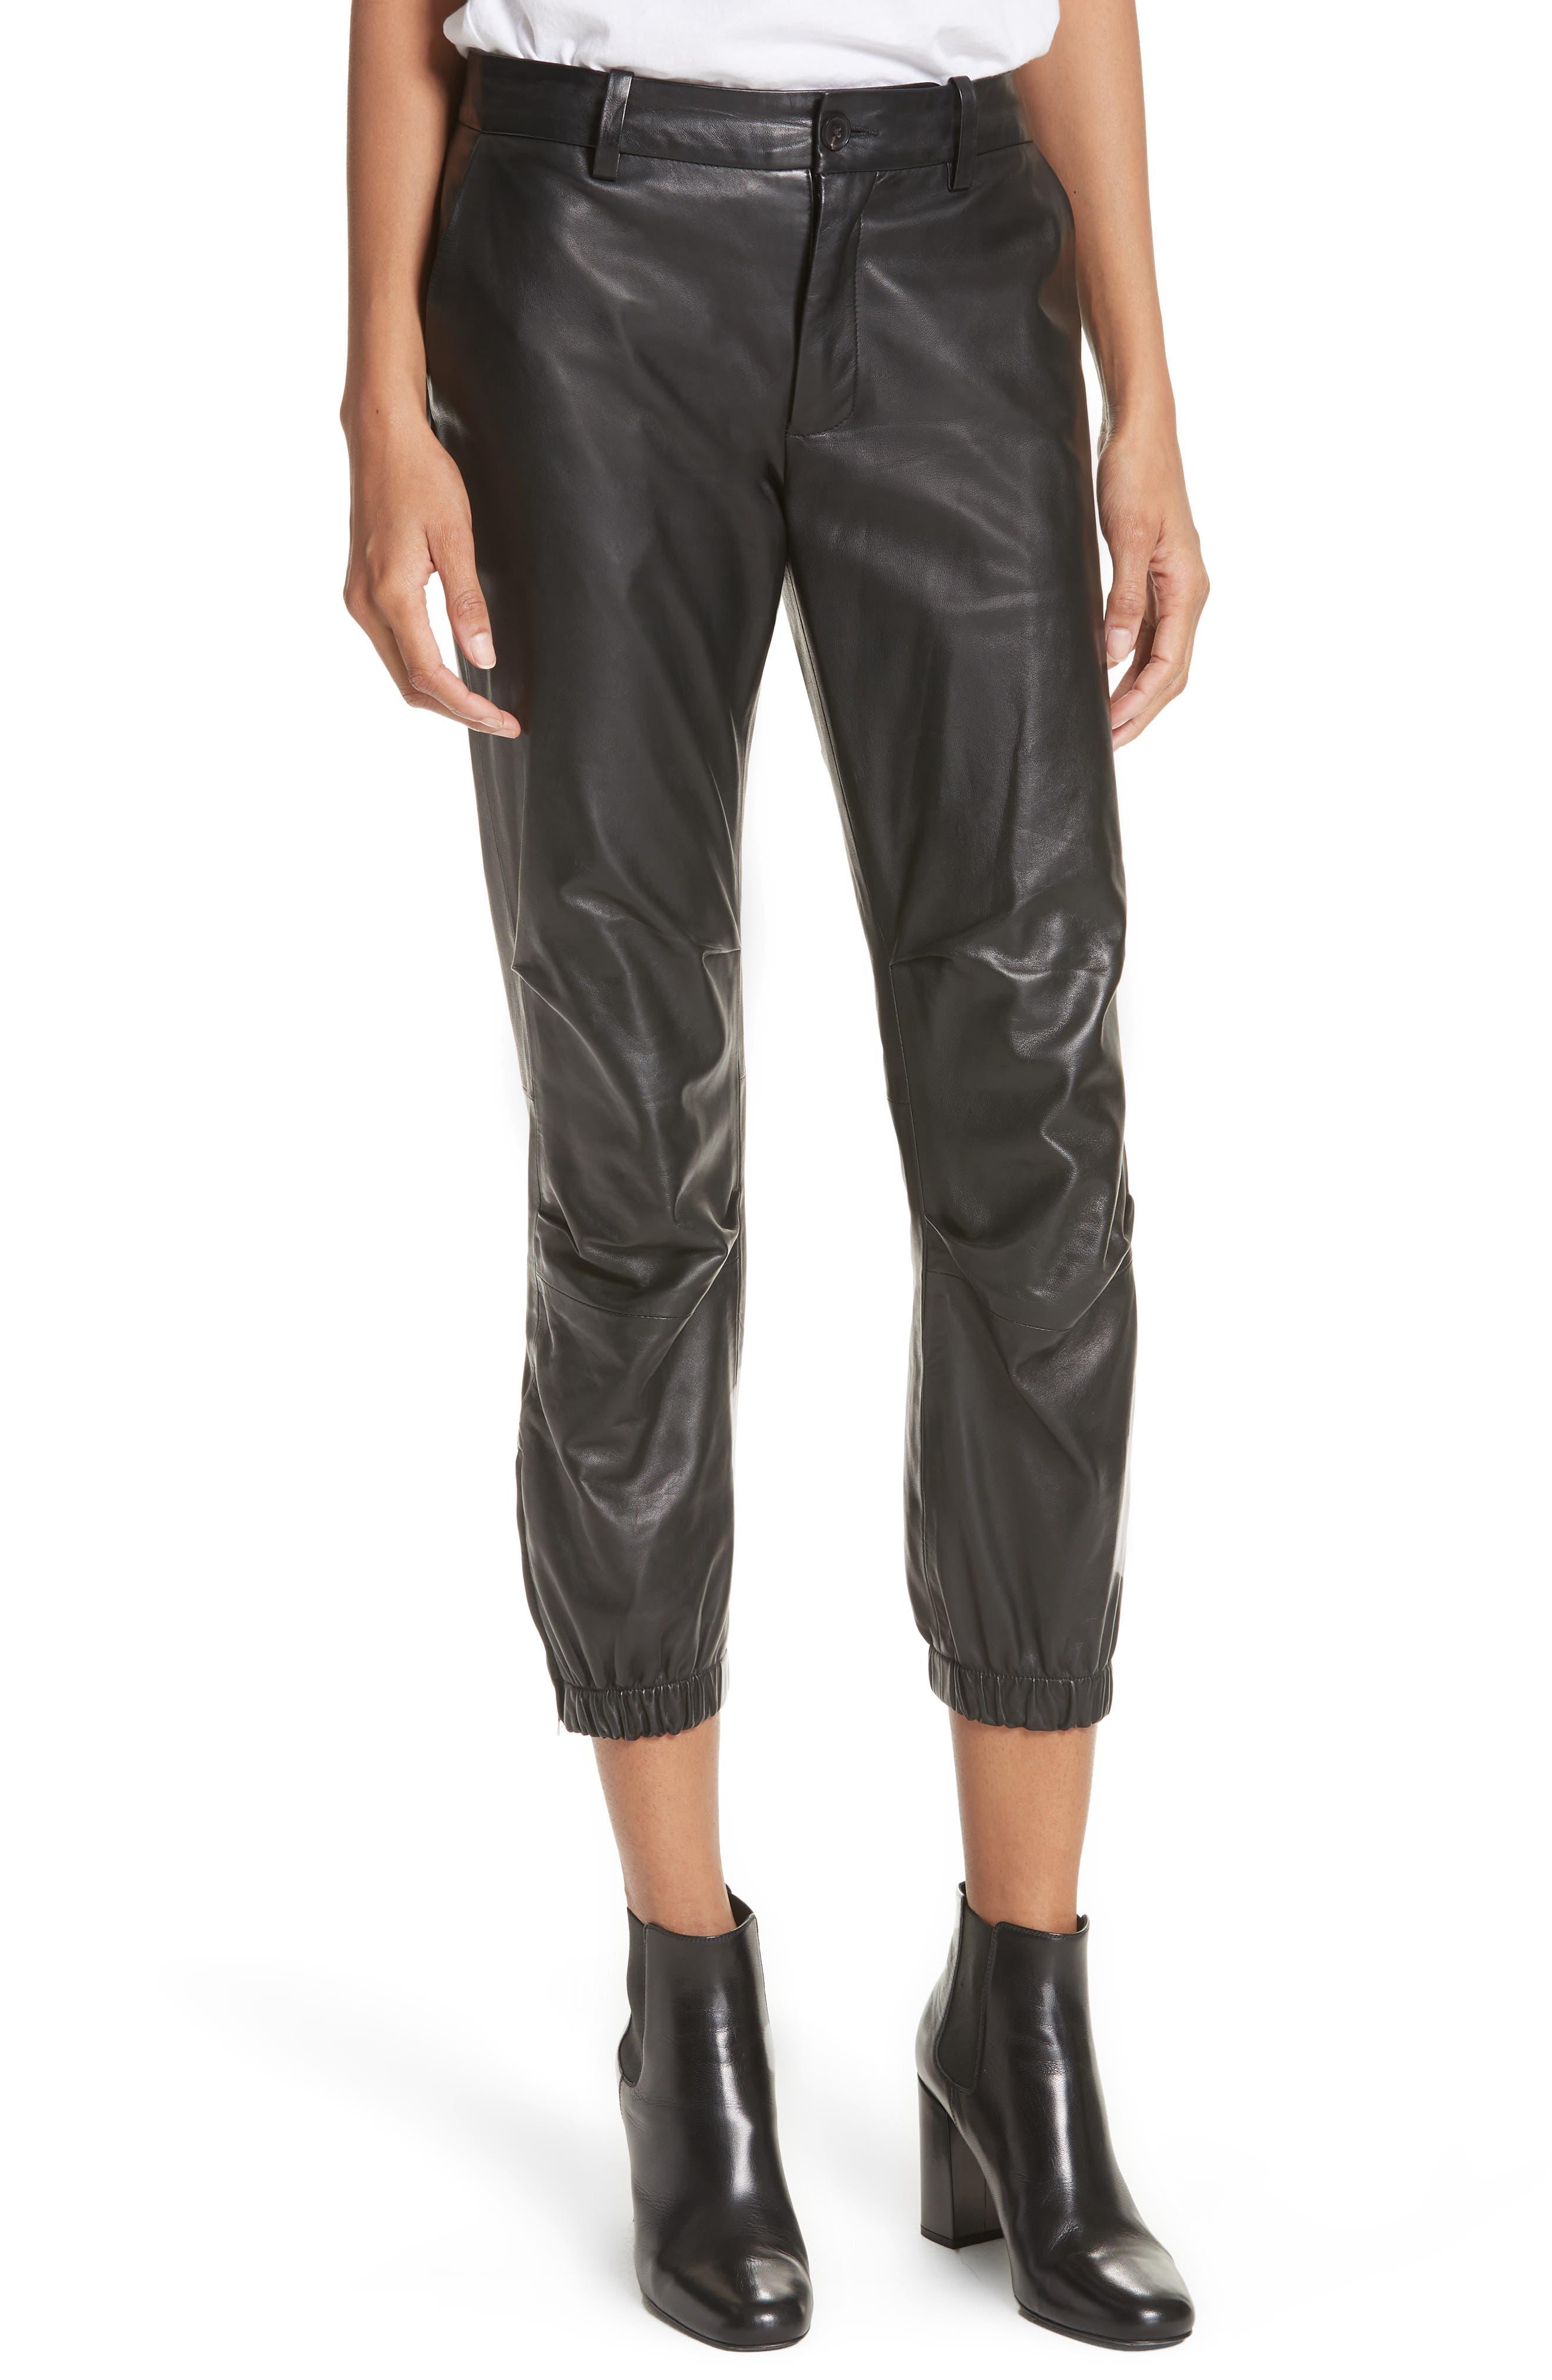 NILI LOTAN, French Military Leather Crop Pants, Main thumbnail 1, color, BLACK